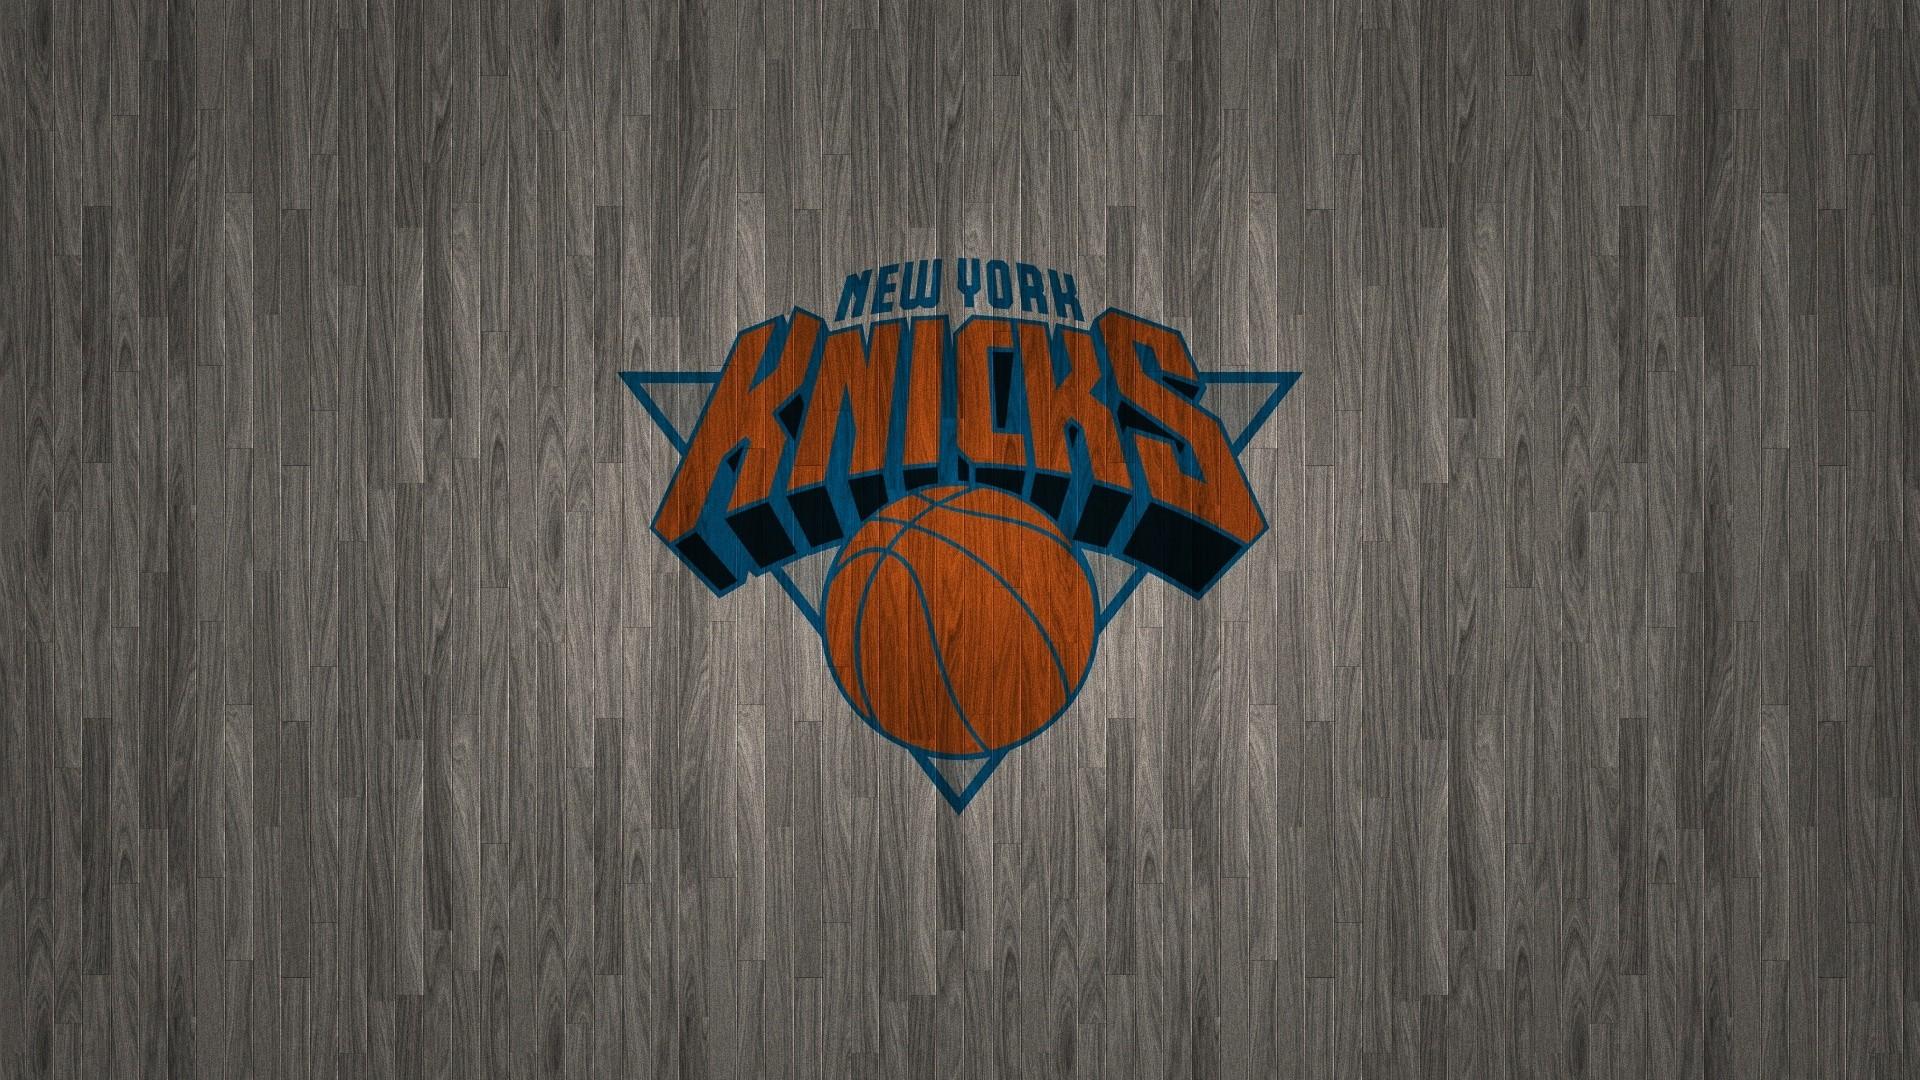 New York Knicks Wallpapers